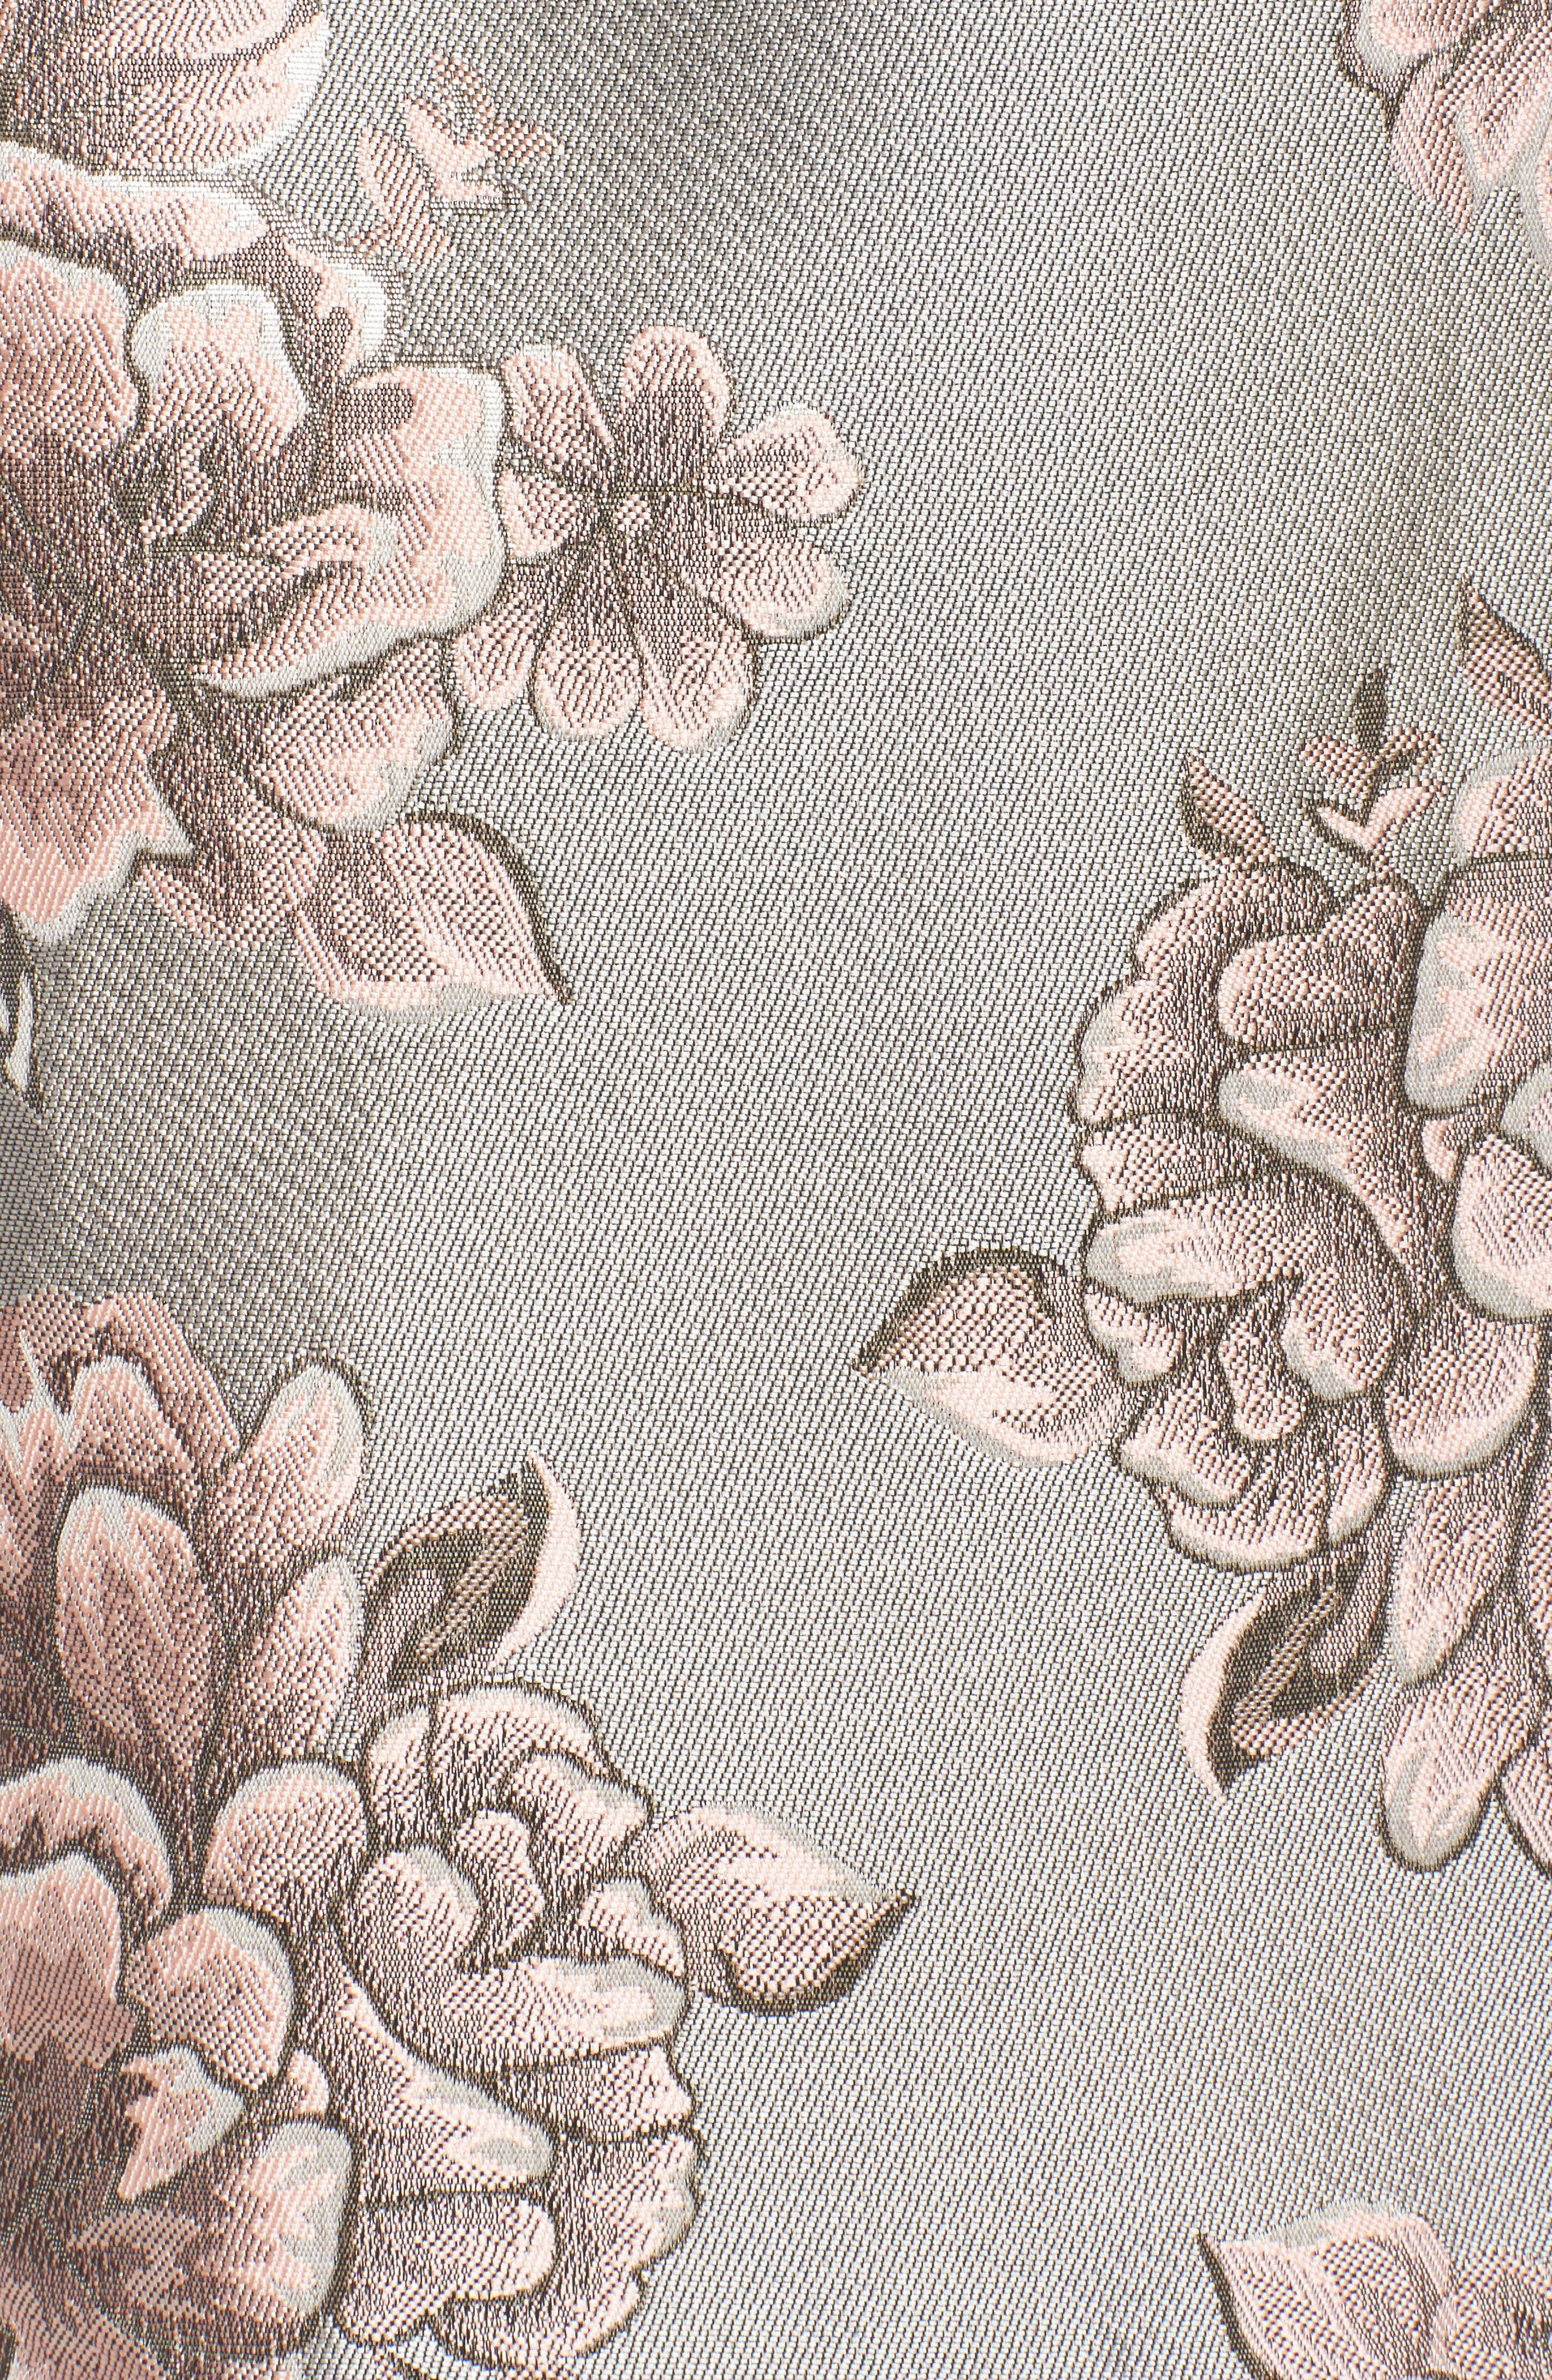 Metallic Floral Fit & Flare Dress,                             Alternate thumbnail 5, color,                             041